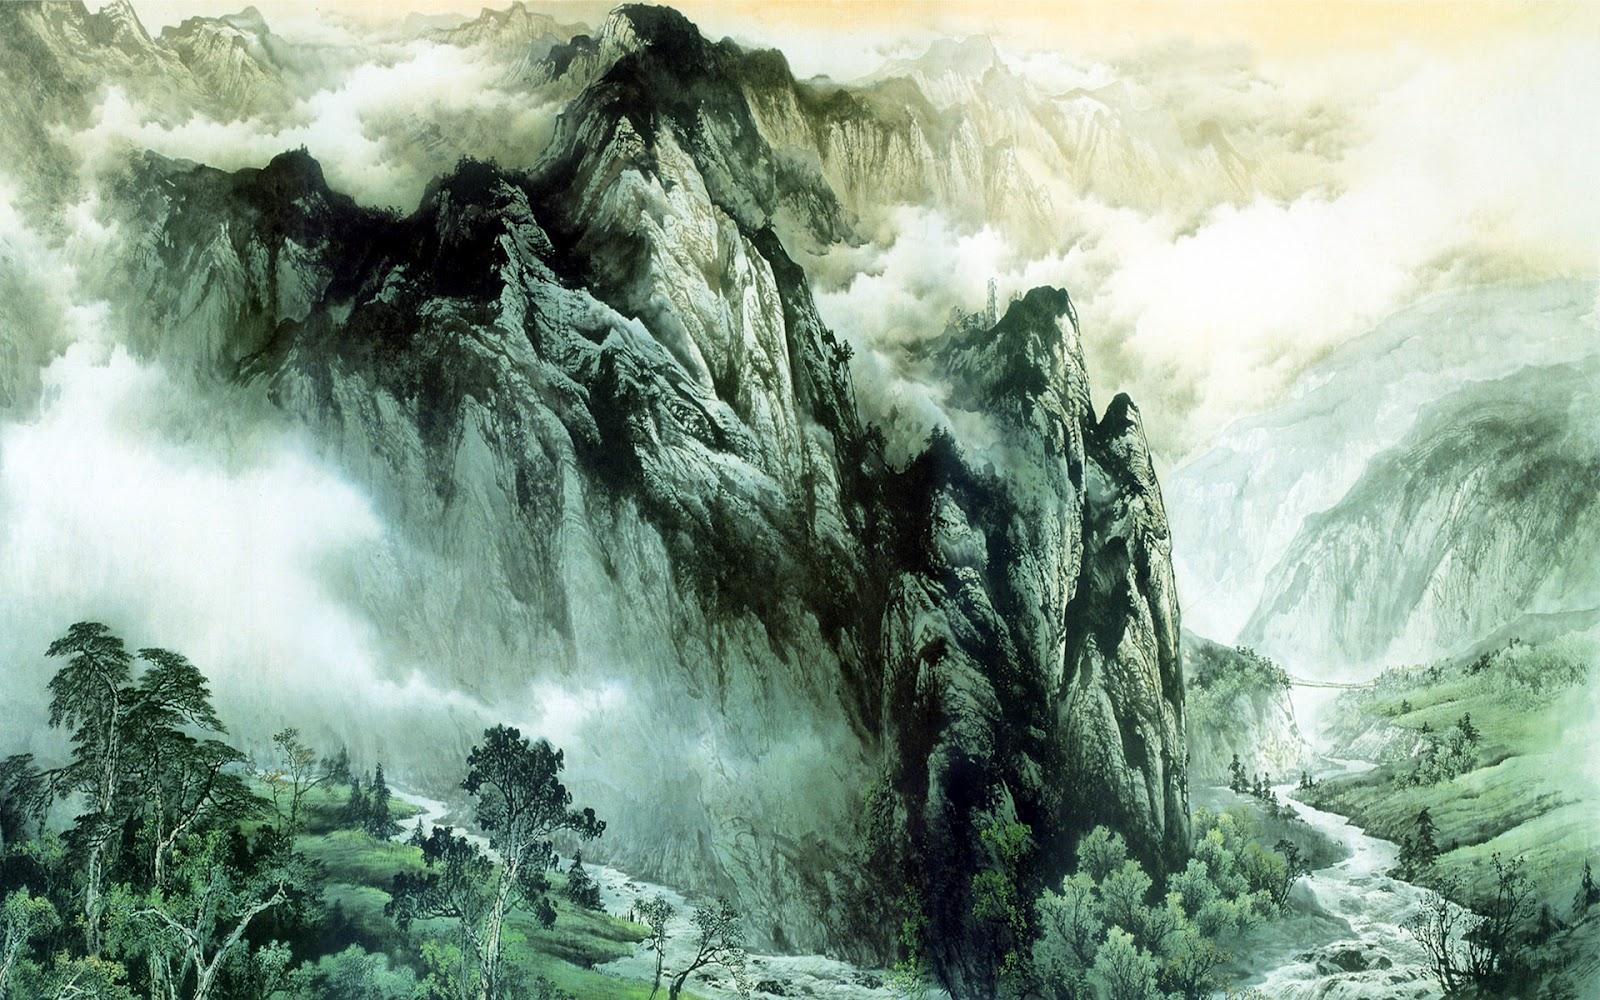 Wallpapers Dekstop 4 U: Asian Art Wallpaper